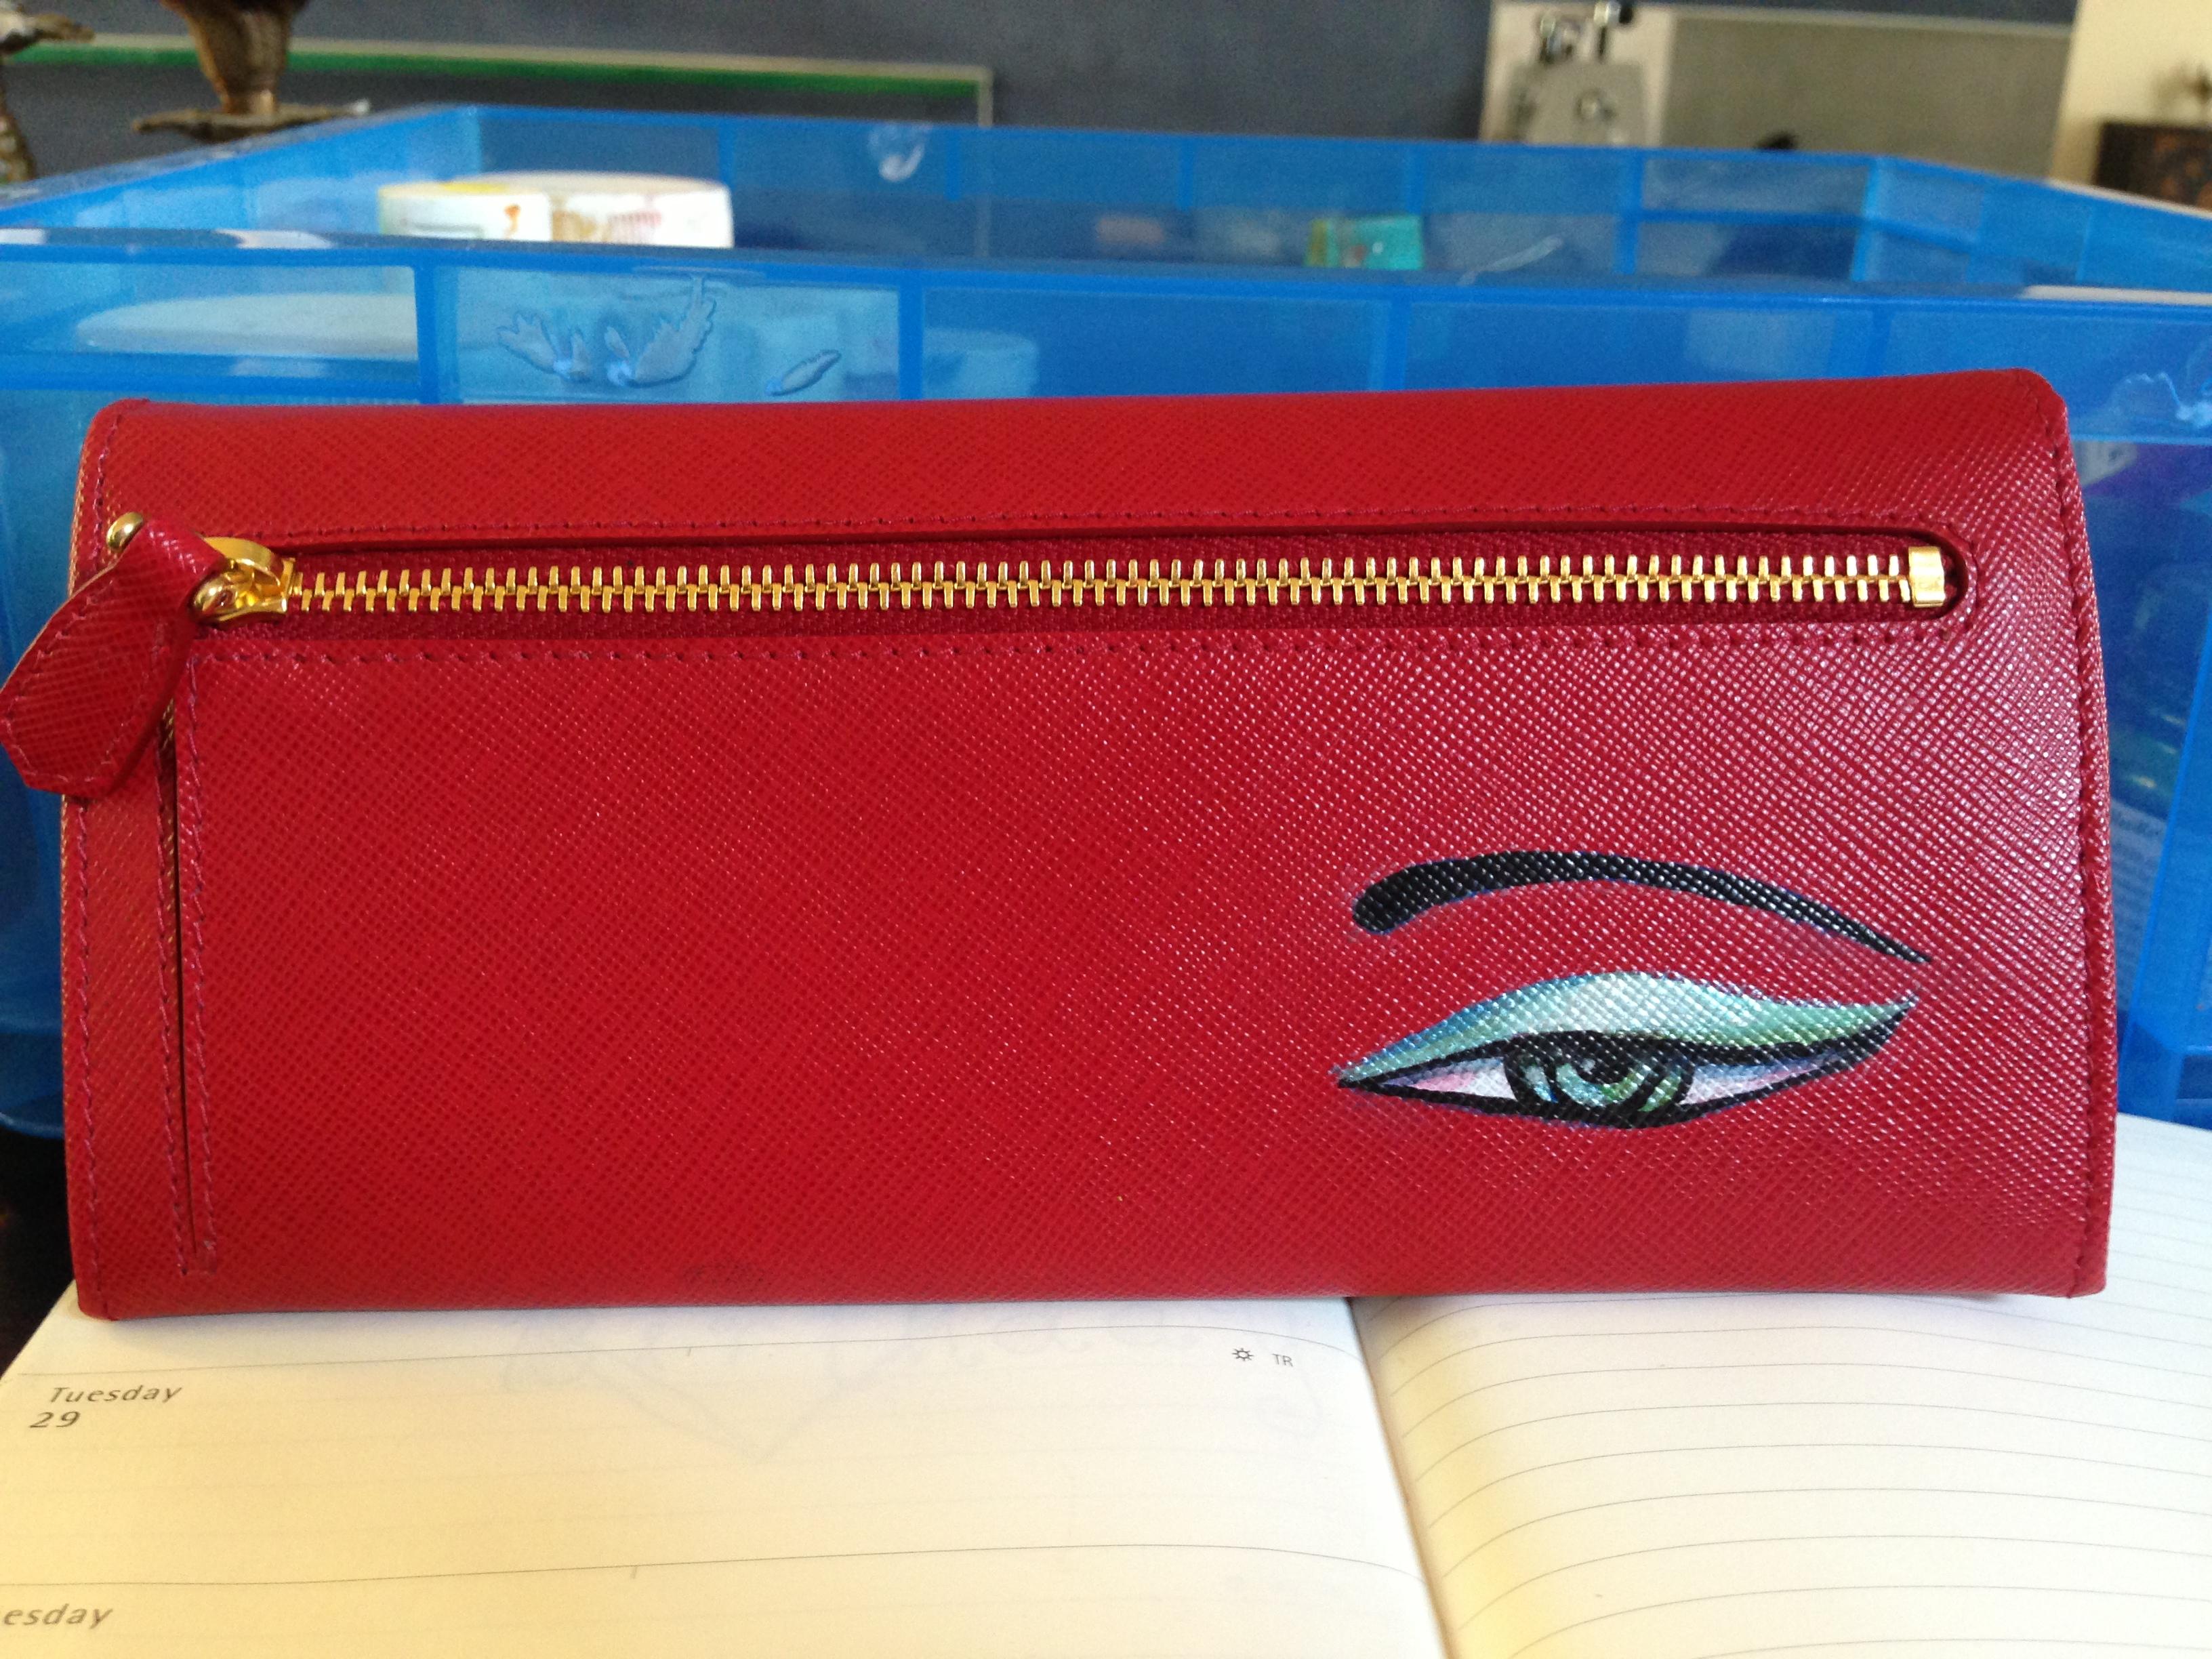 eye on prada wallet